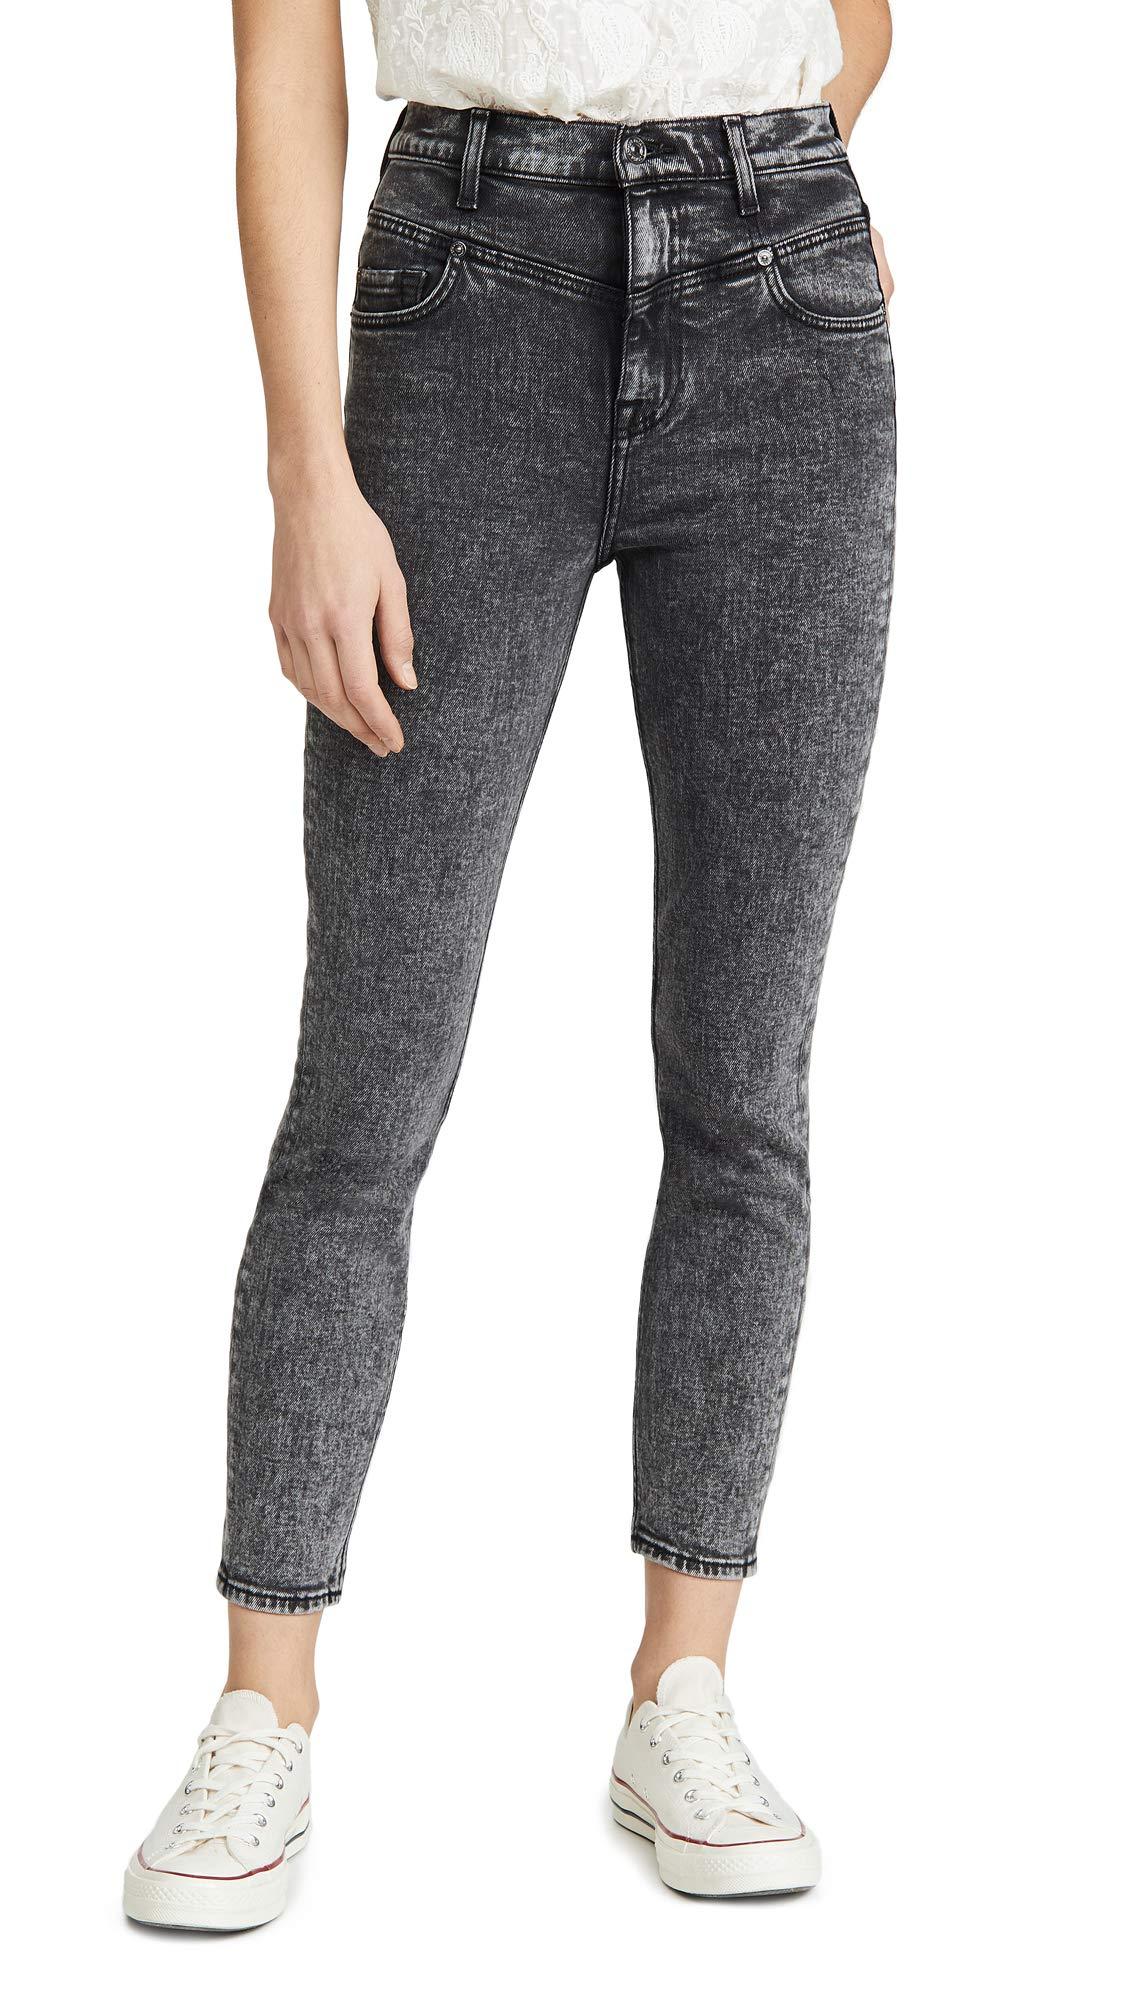 7 For All Mankind Women's Retro Corset Jeans